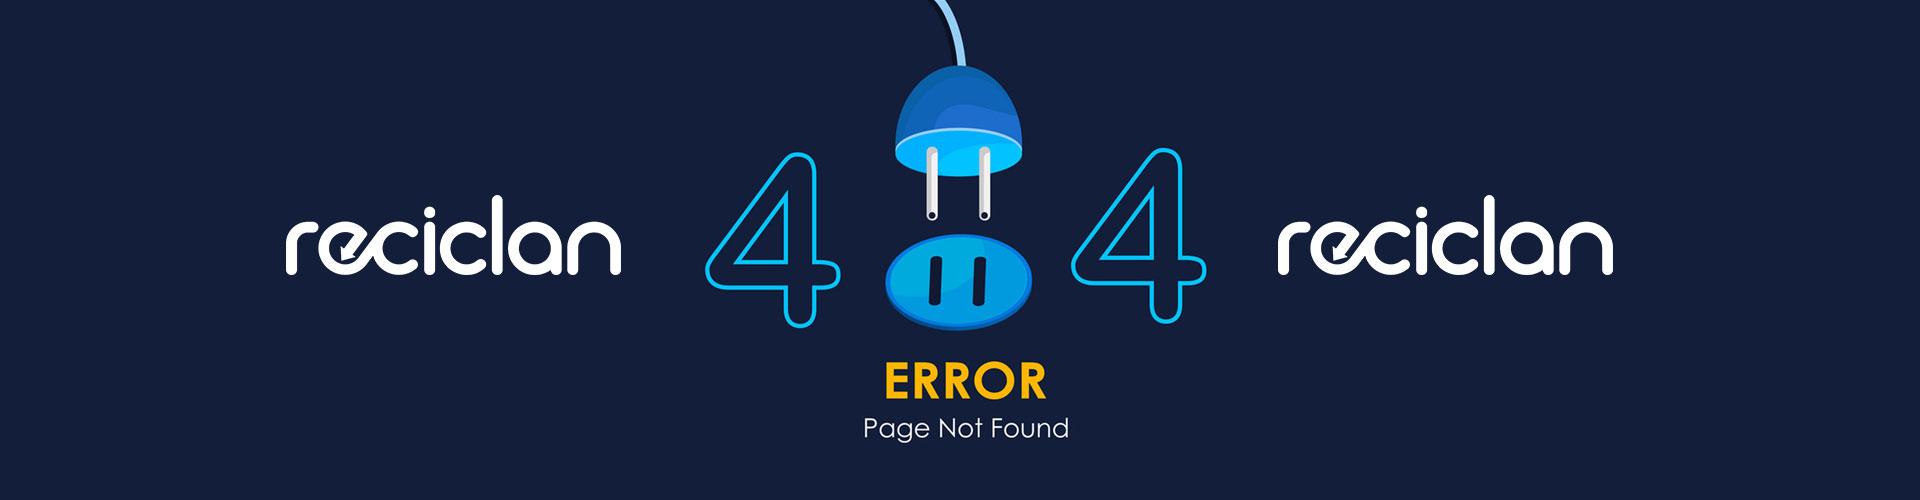 reciclan-banner-404